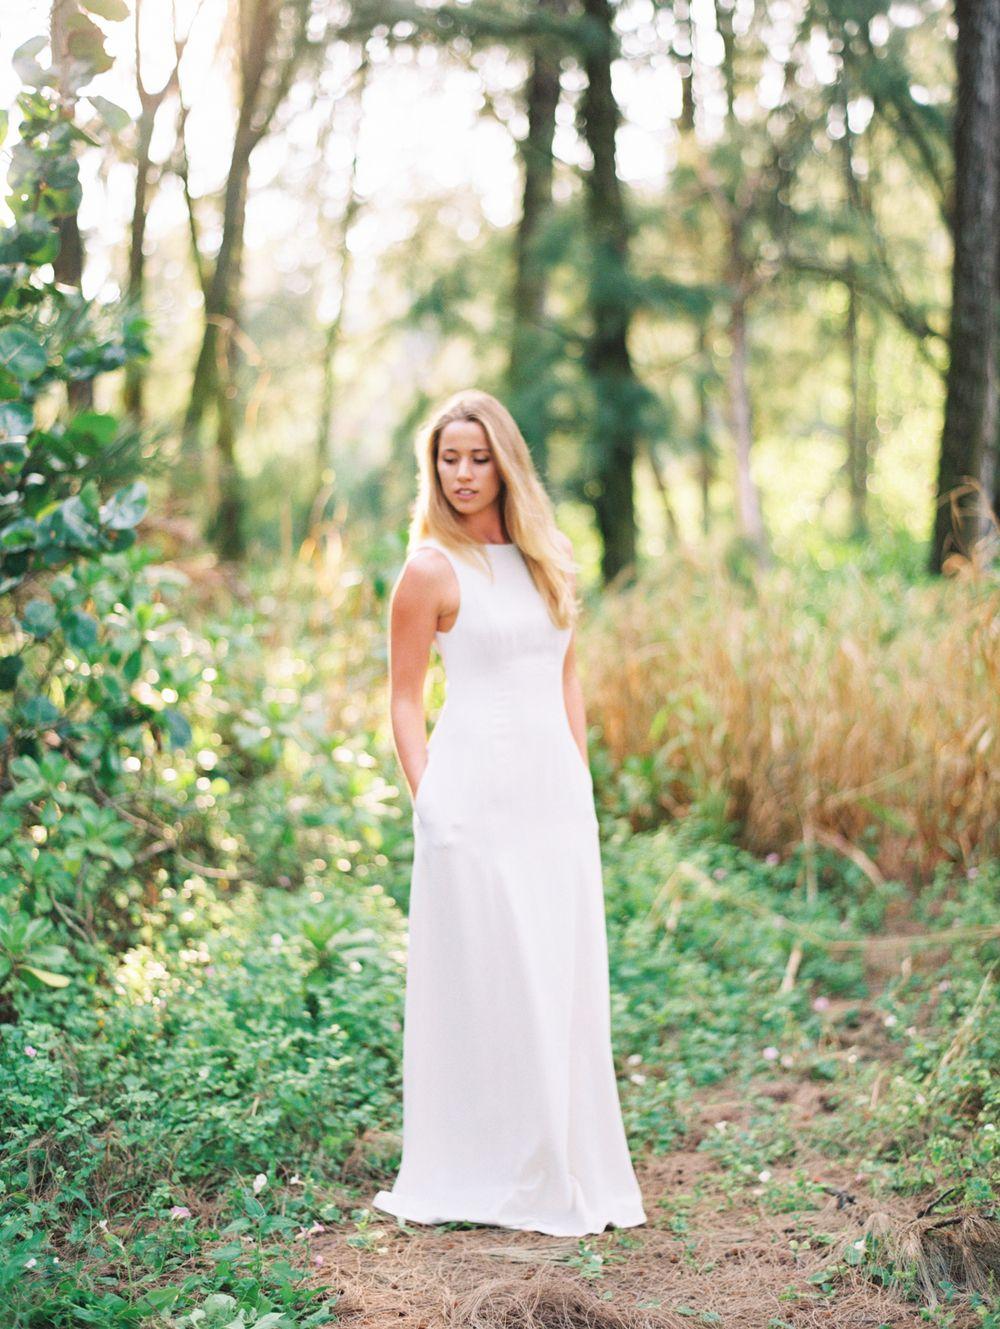 Kylie Martin Lydie Gown #film #filmphotography #filmsnotdead #wedding #weddingphotographer #weddingphotography #bridal #bride #model #weddingdress #simpleweddingdress #weddingportraits #weddingprotrait #hawaii #hawaiian #couple #love #engagement